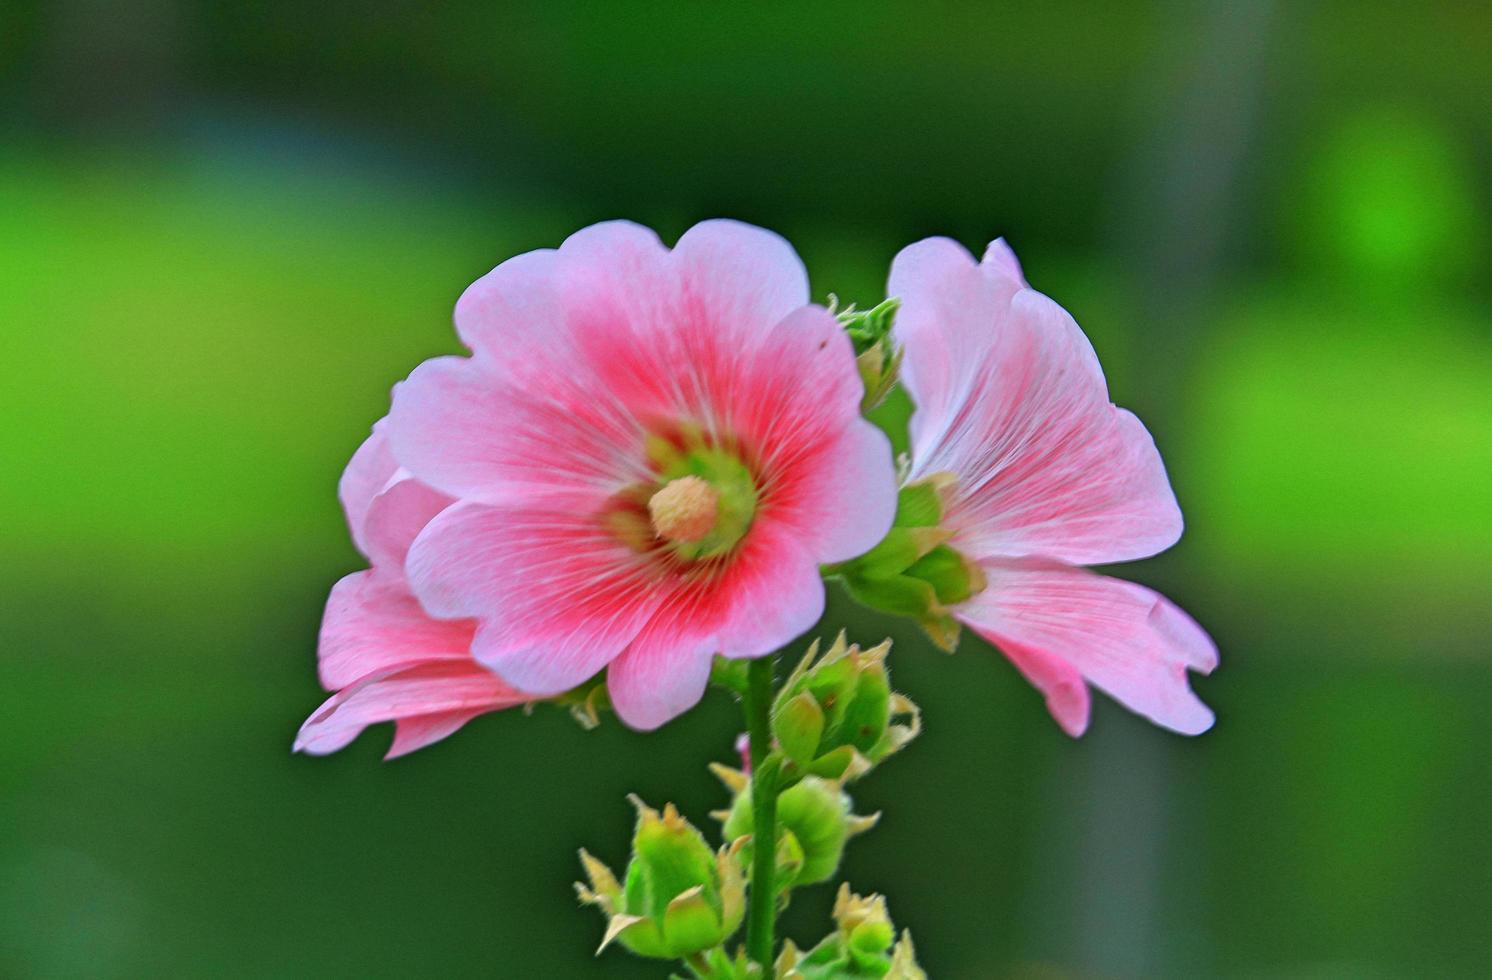 Fleurs de malva rose qui fleurit dans le jardin photo